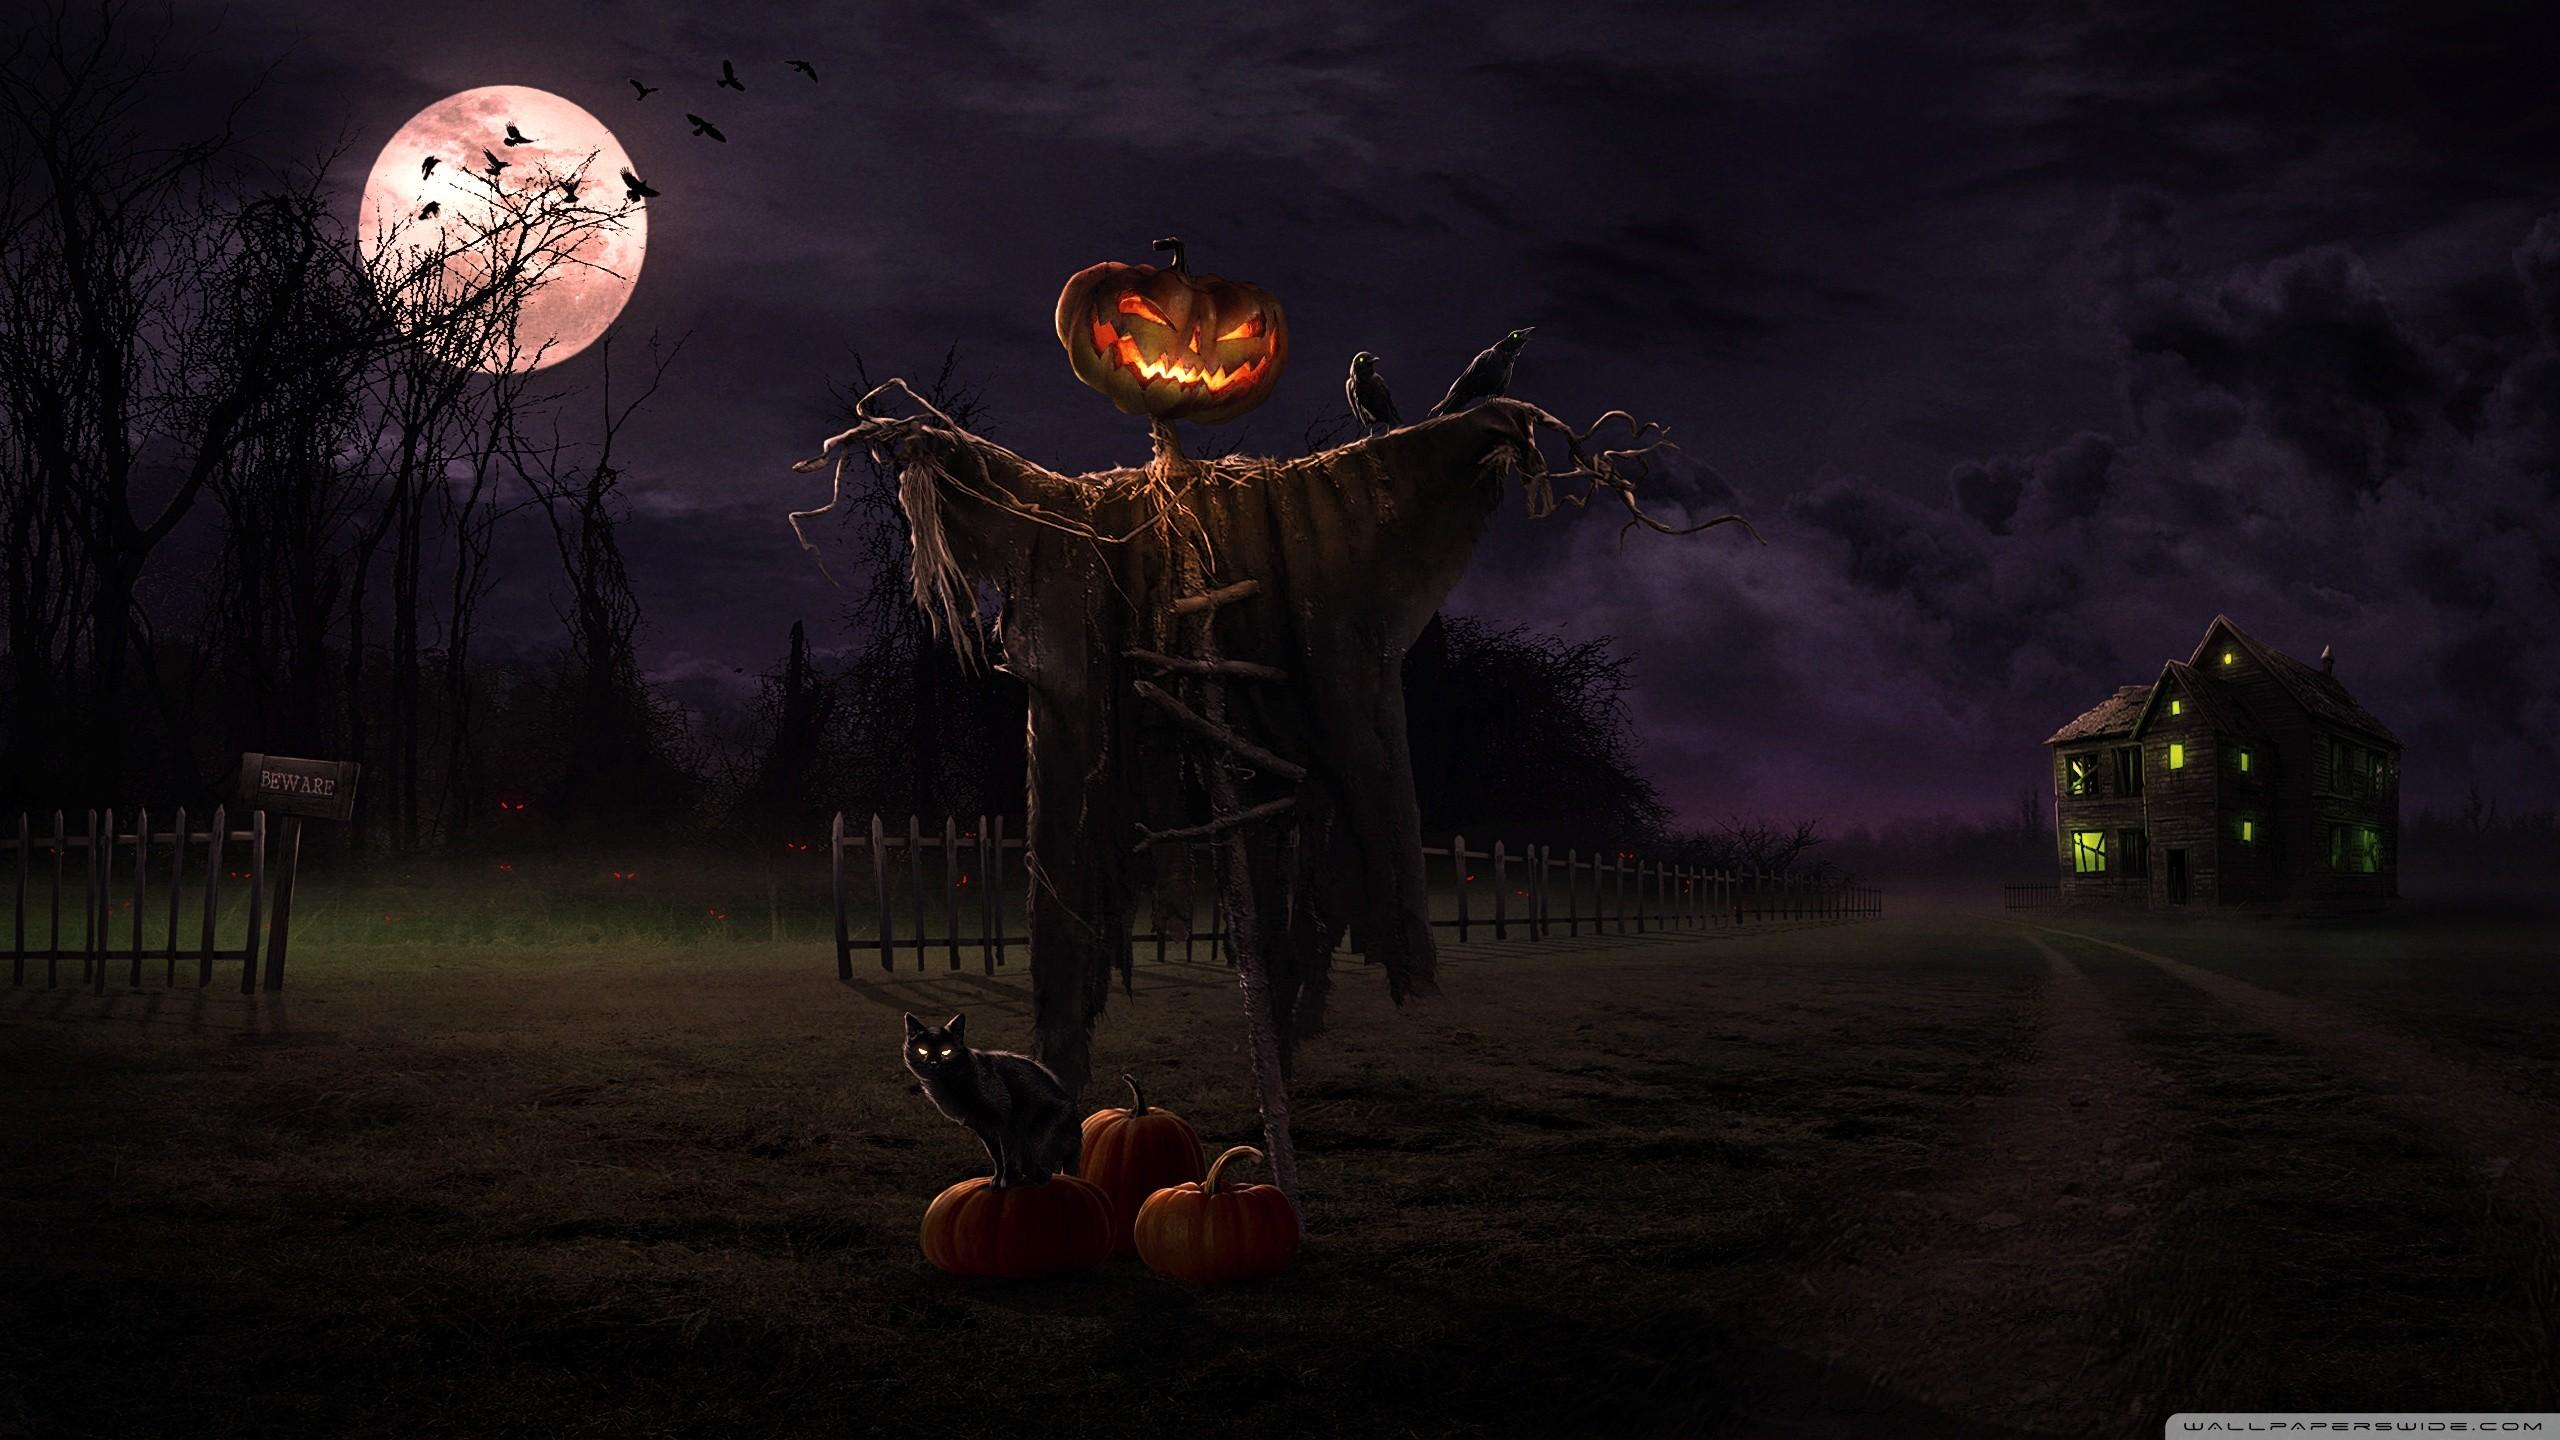 Halloween Live Wallpaper For Pc   Halloween Wallpapers Full Hd 2560x1440